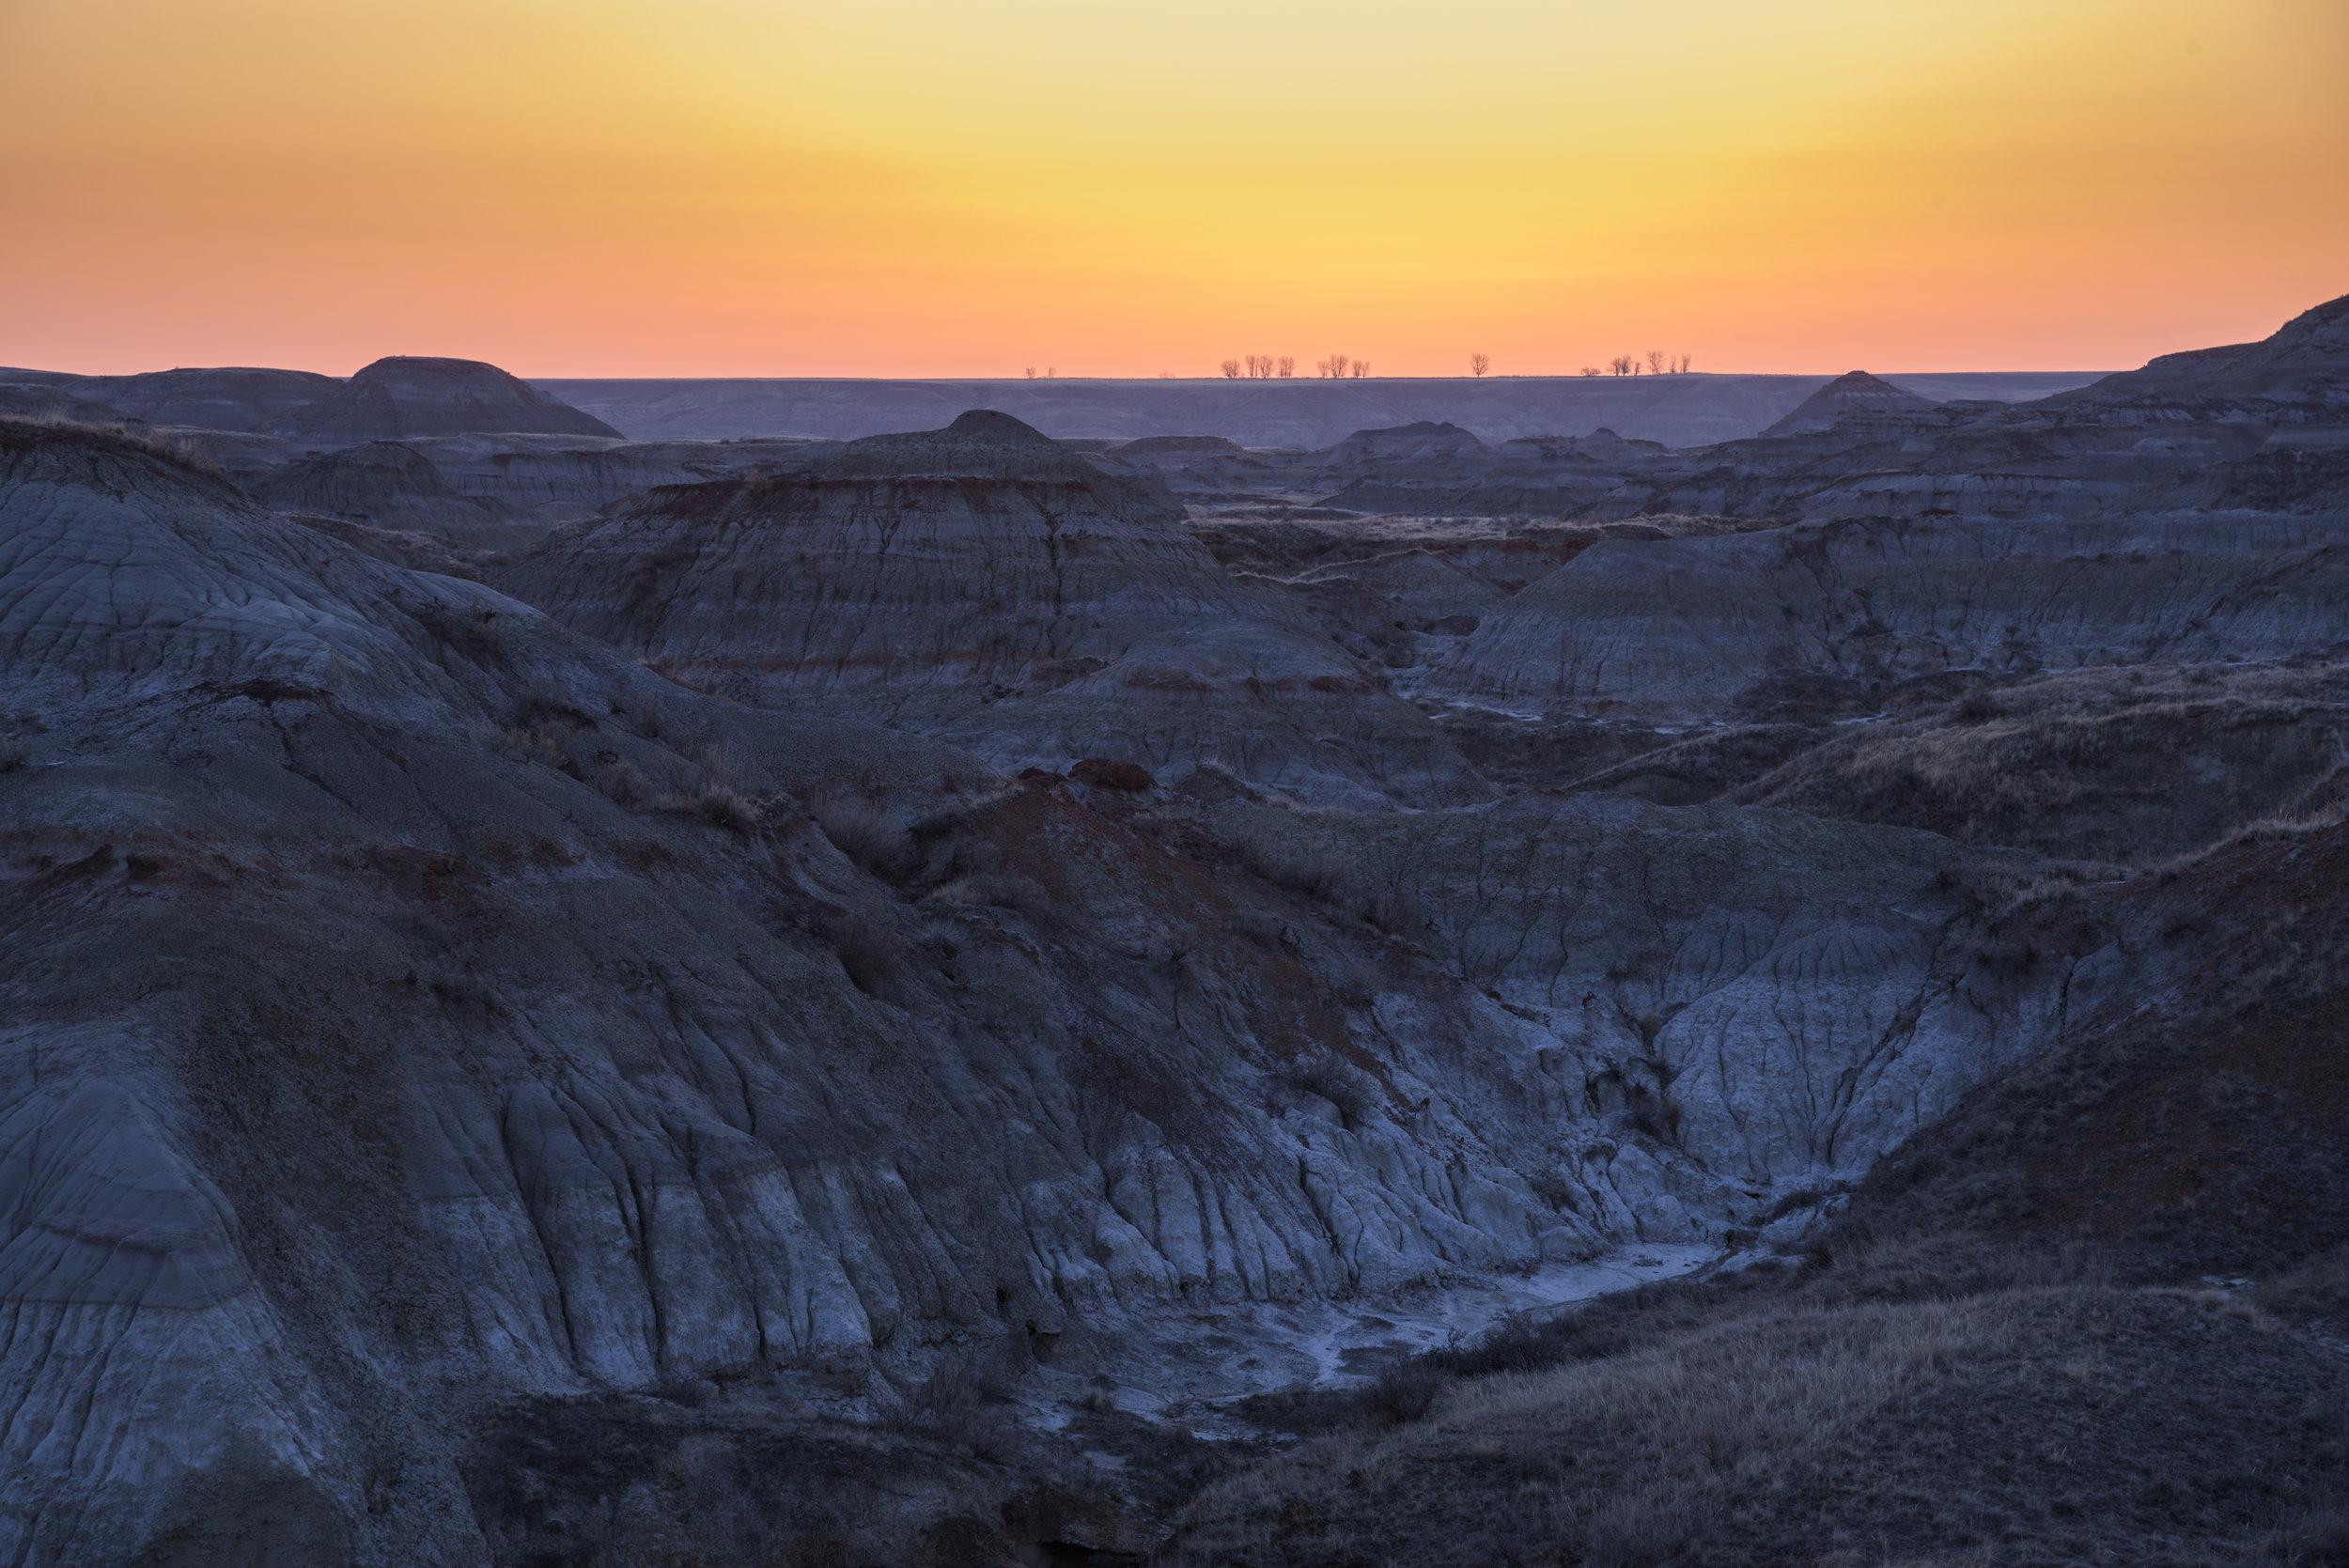 Sunrise over the Canadian Badlands, Dinosaur Provincial Park